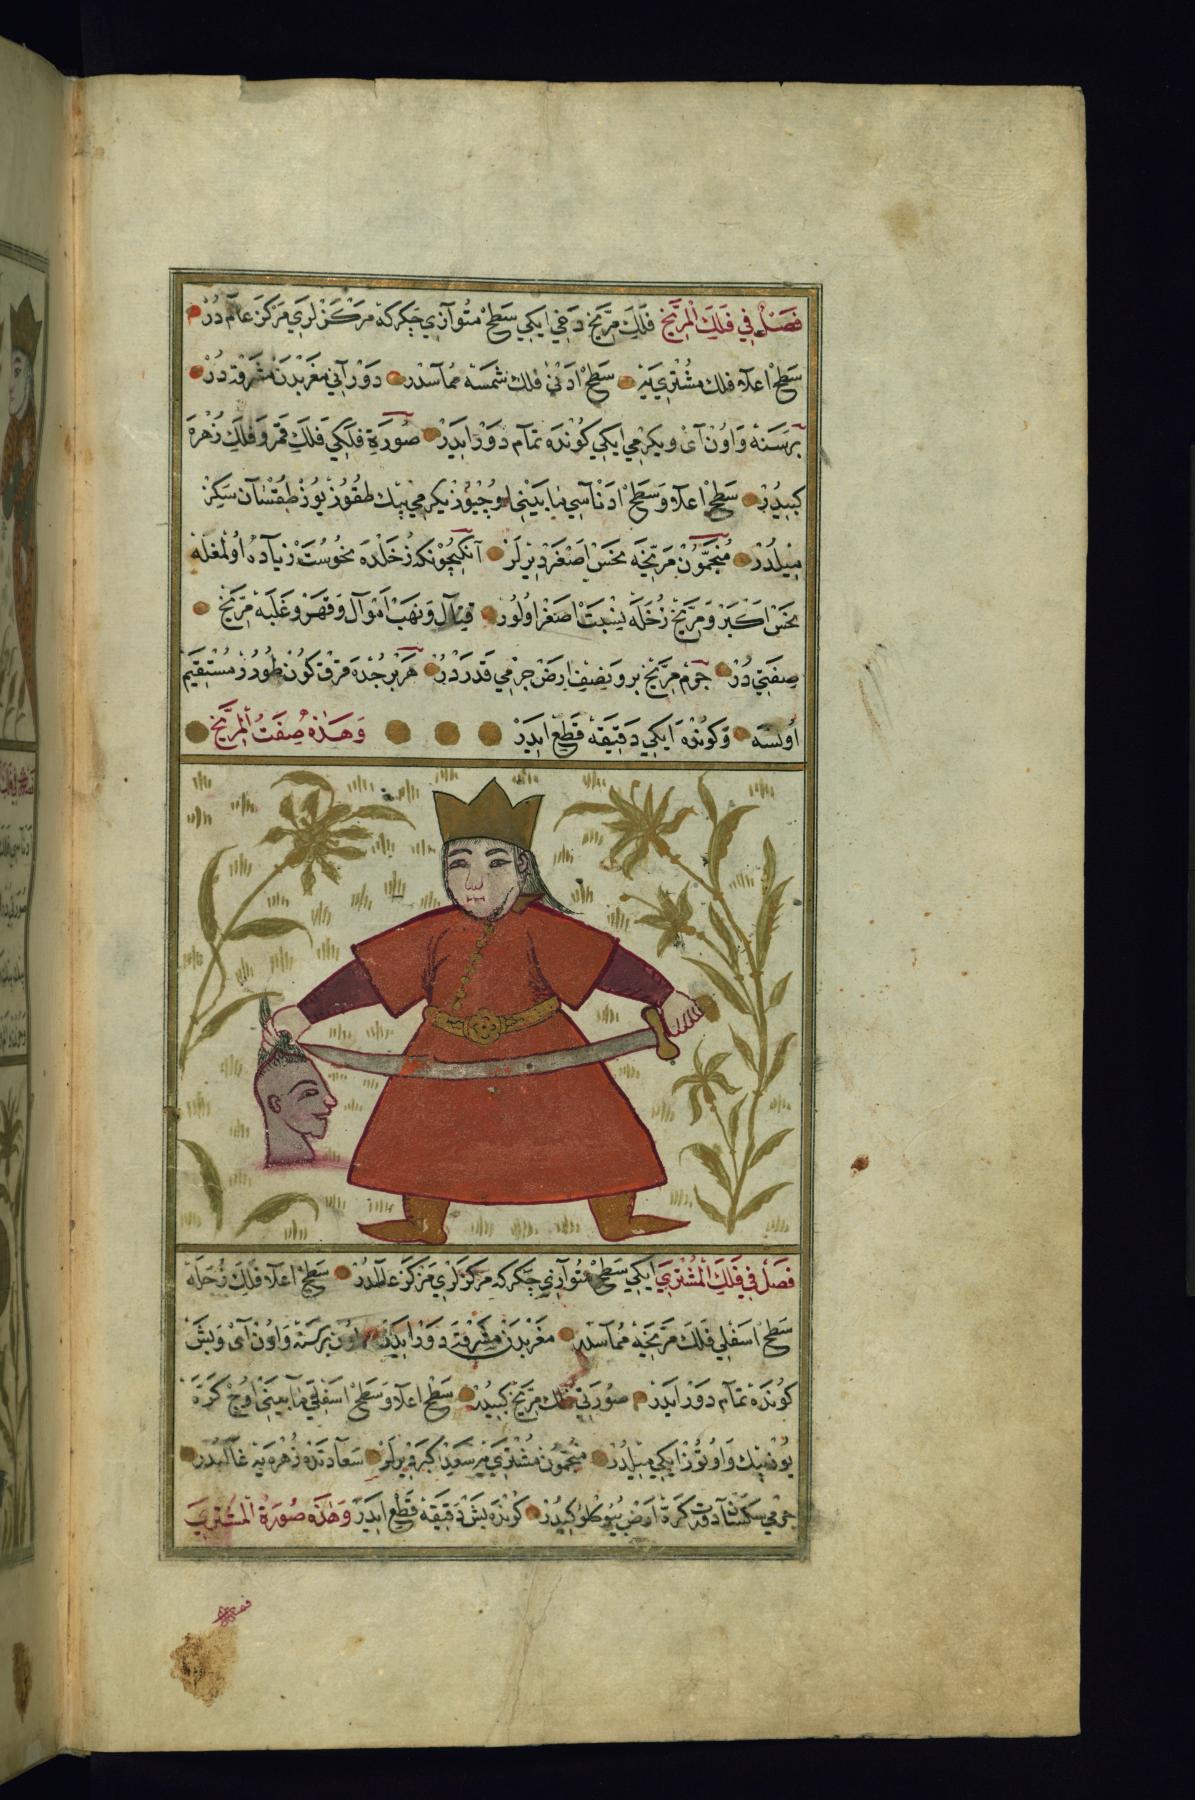 muhammad ibn muhammad shakir ruzmah-'i nathani - symbol of mars - walters w65914b - full page.jpg